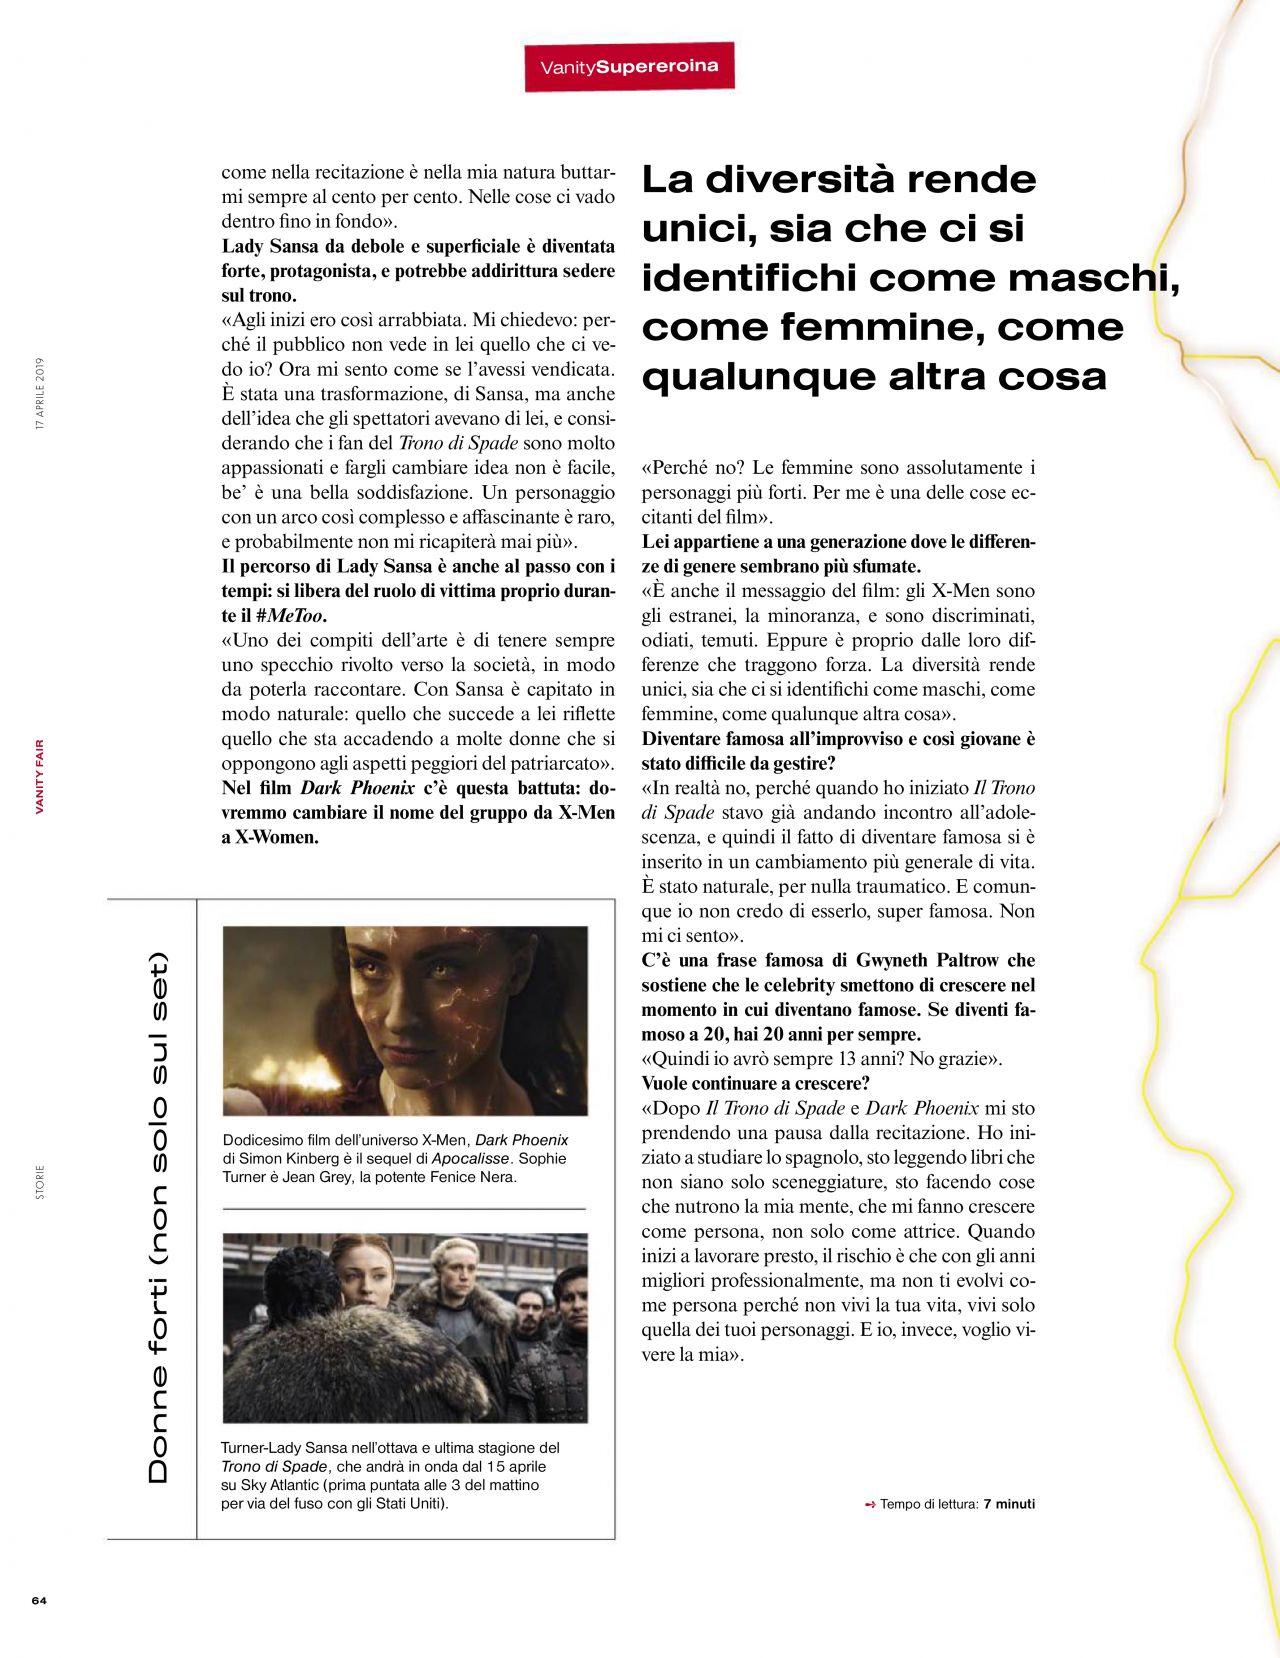 Sophie Turner - Vanity Fair Magazine Italy April 2019